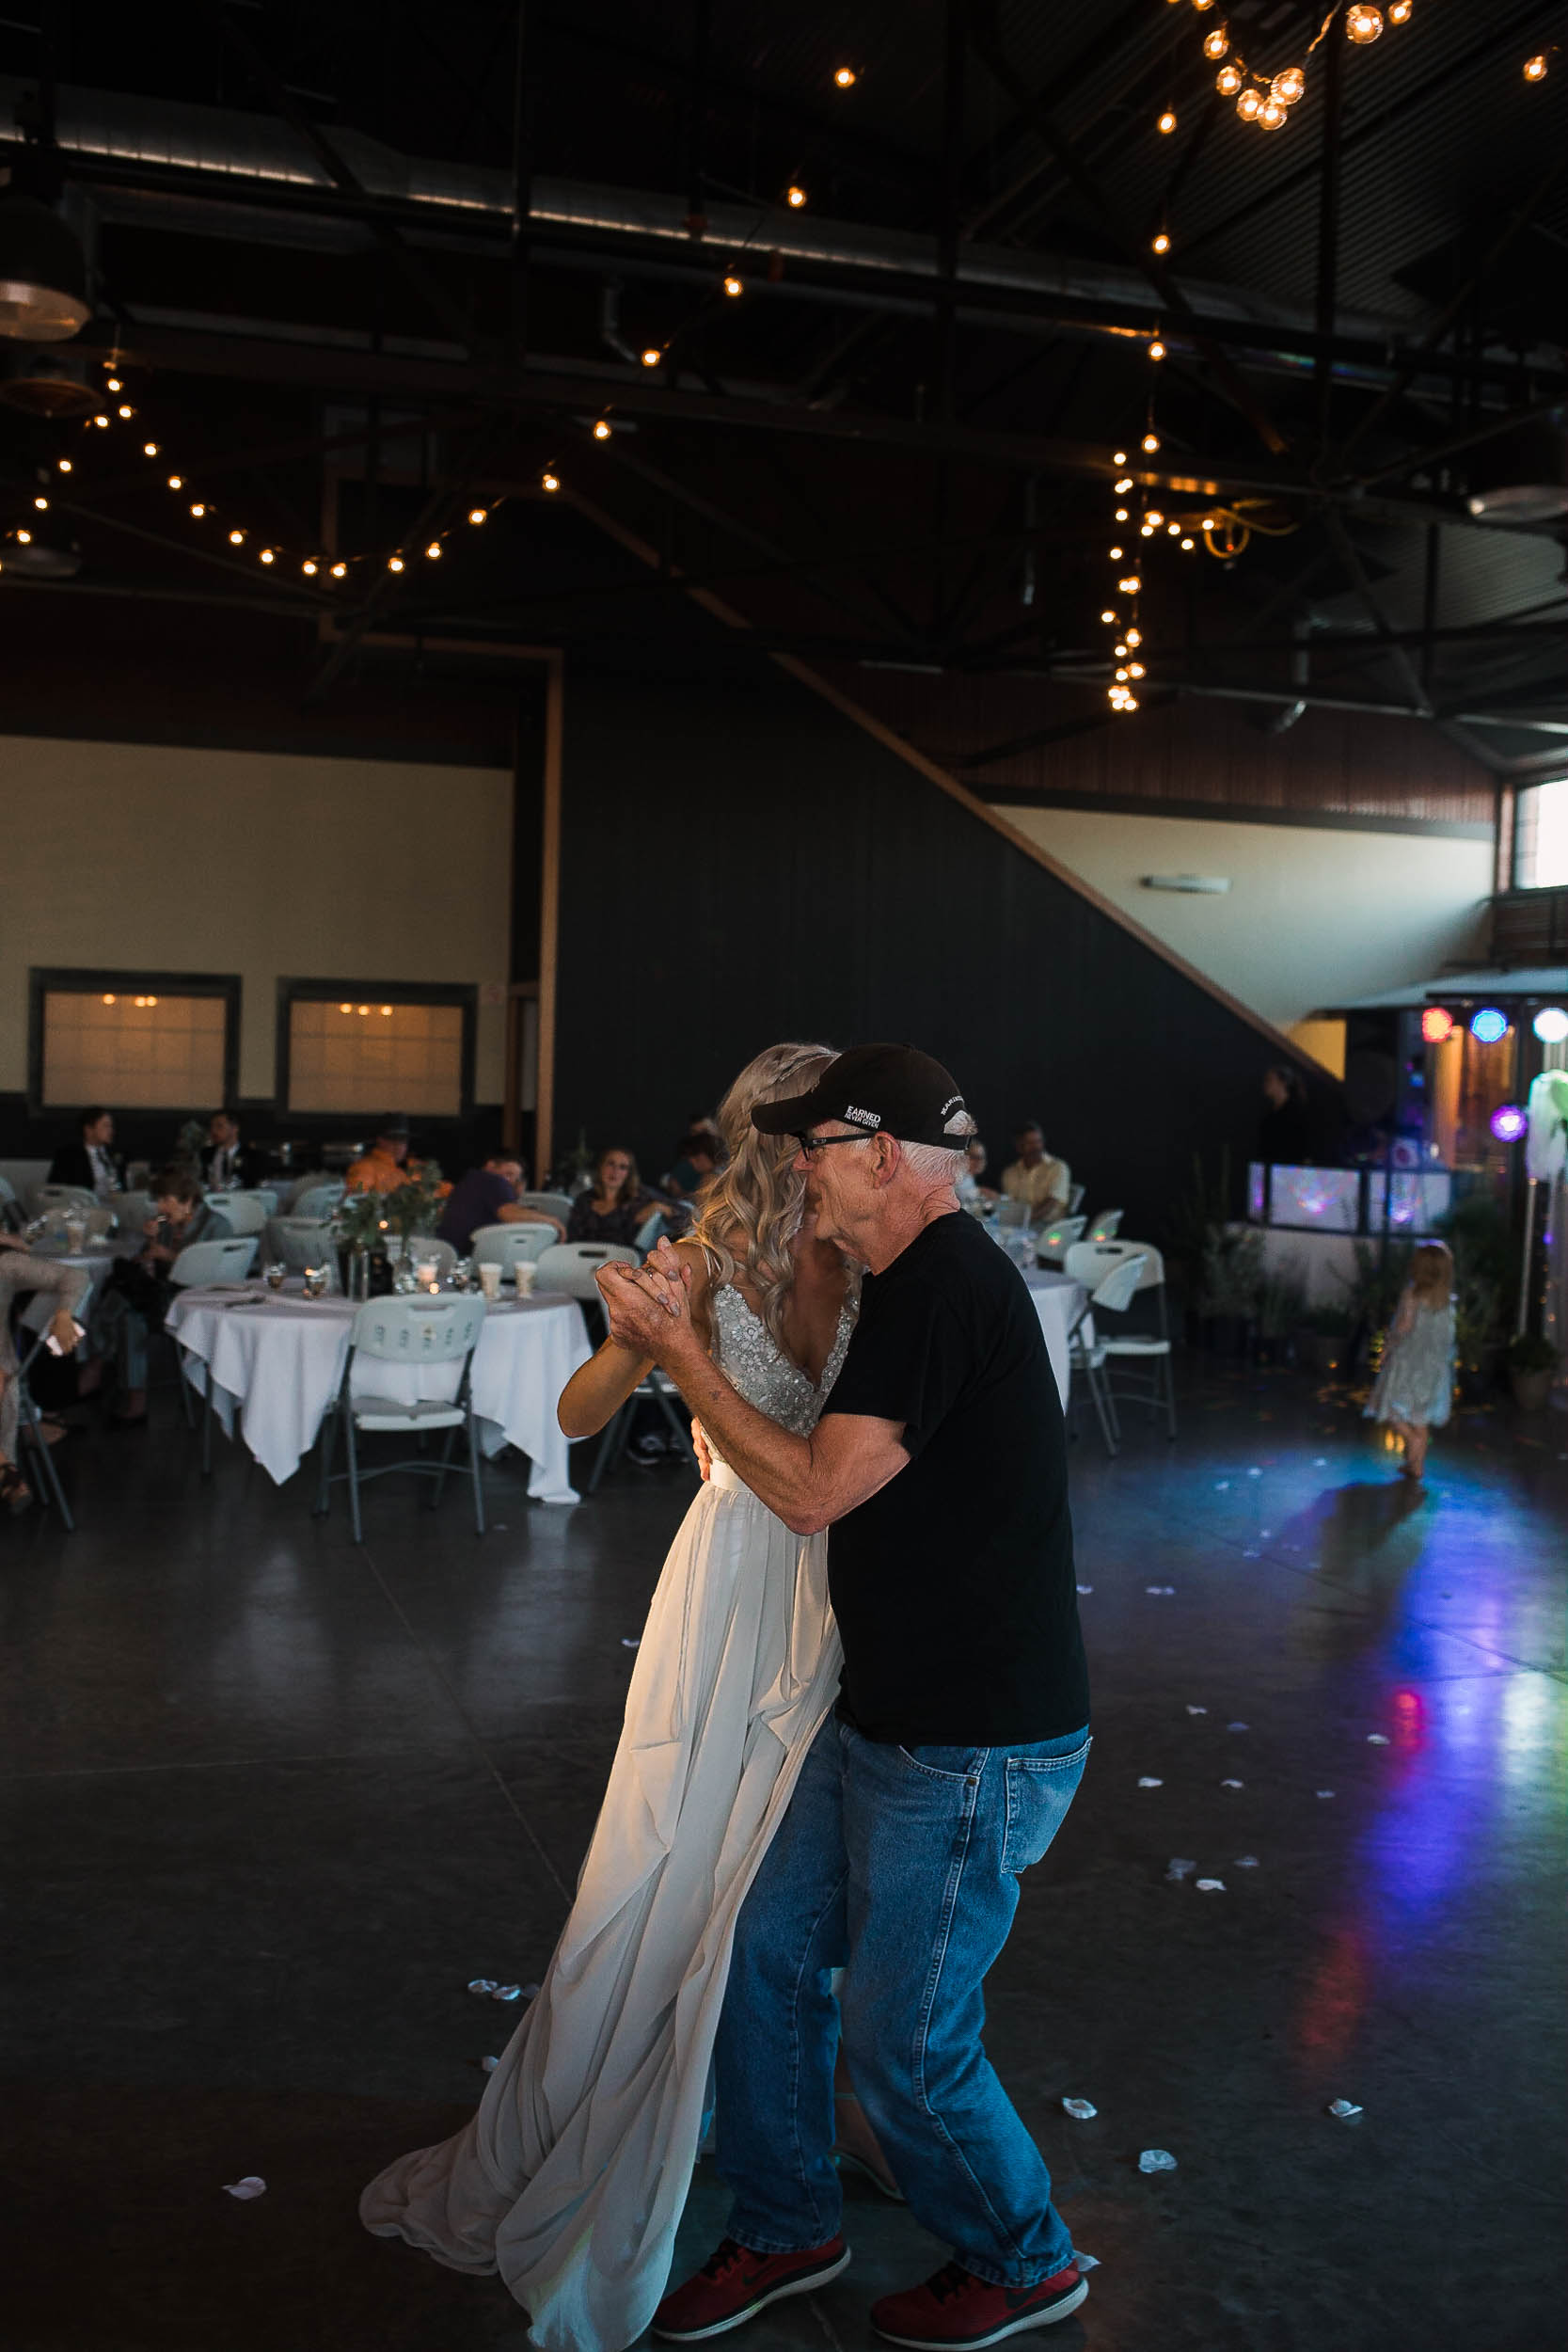 KyleLovesTori-Casper-Wyoming-Wedding-129.jpg